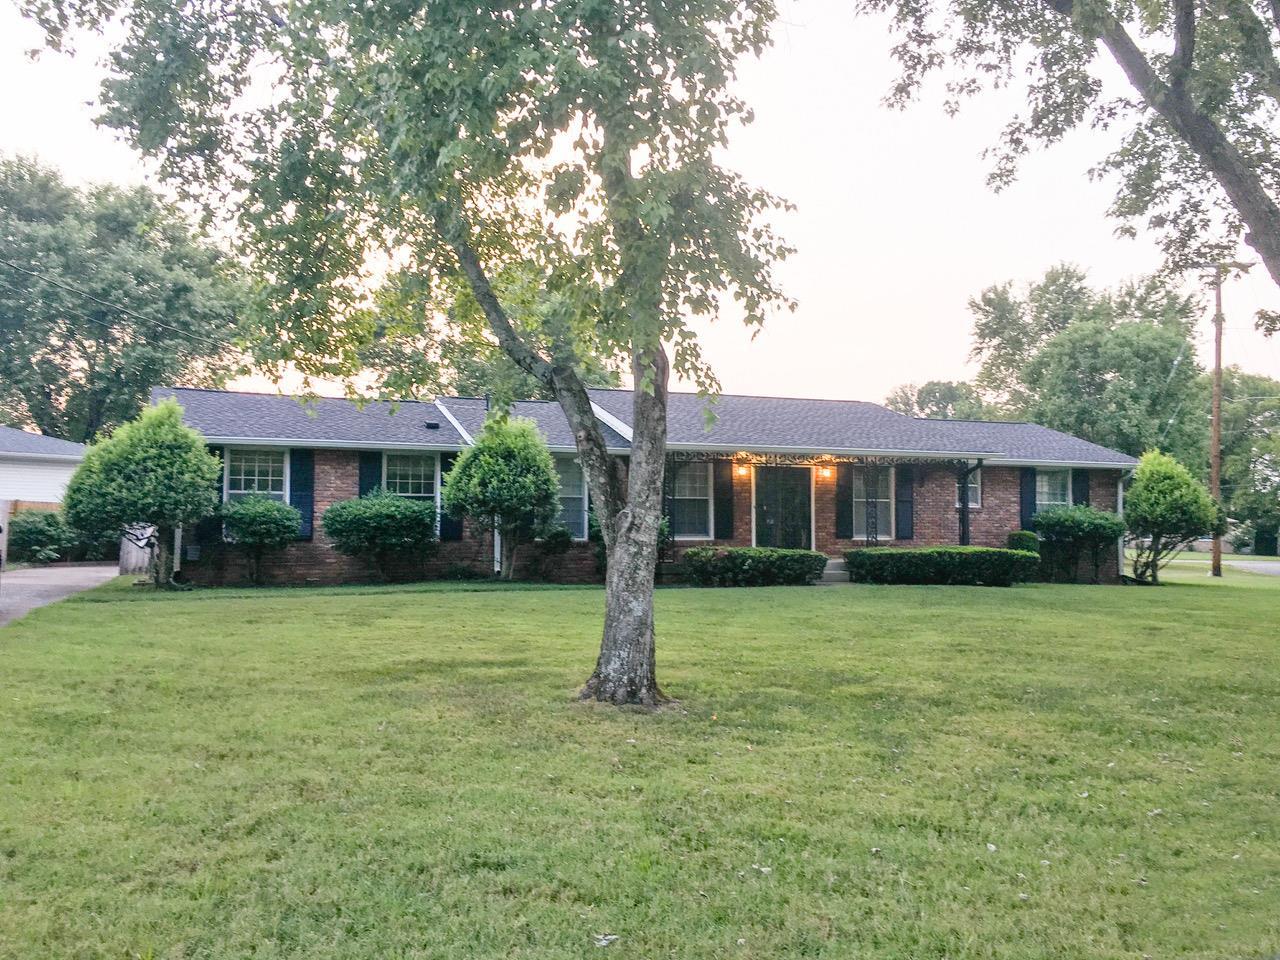 117 Paxton Dr, Hendersonville, TN 37075